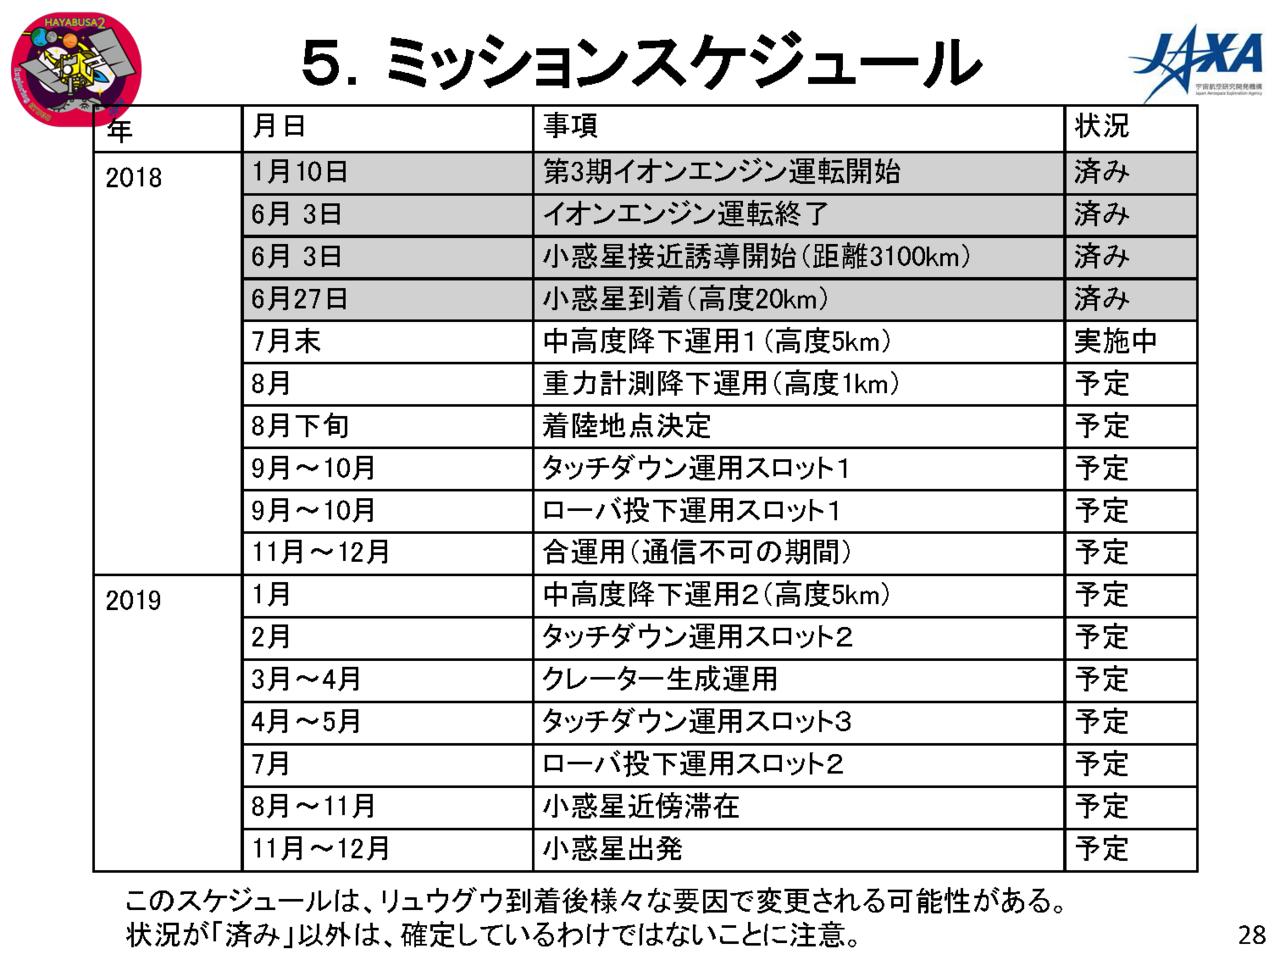 f:id:Imamura:20180802145948p:plain